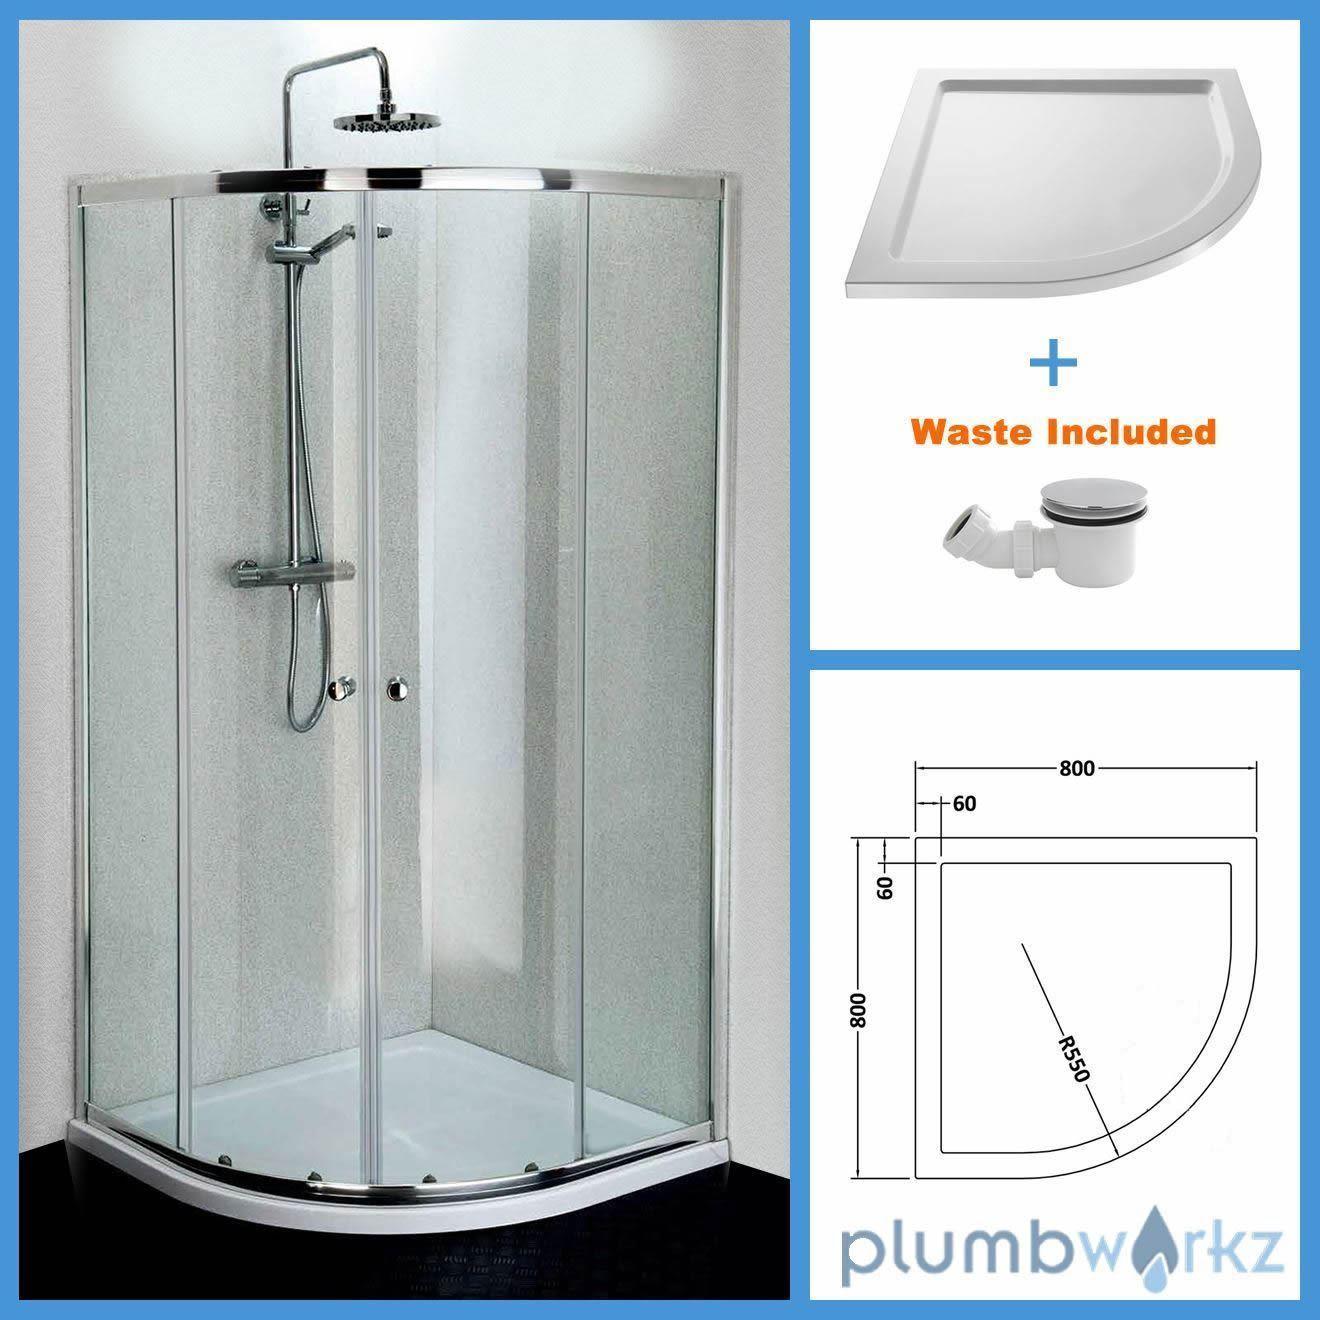 Bathroom suites with shower enclosures - Quadrant Shower Enclosure Wc Amp Basin Bathroom Suite